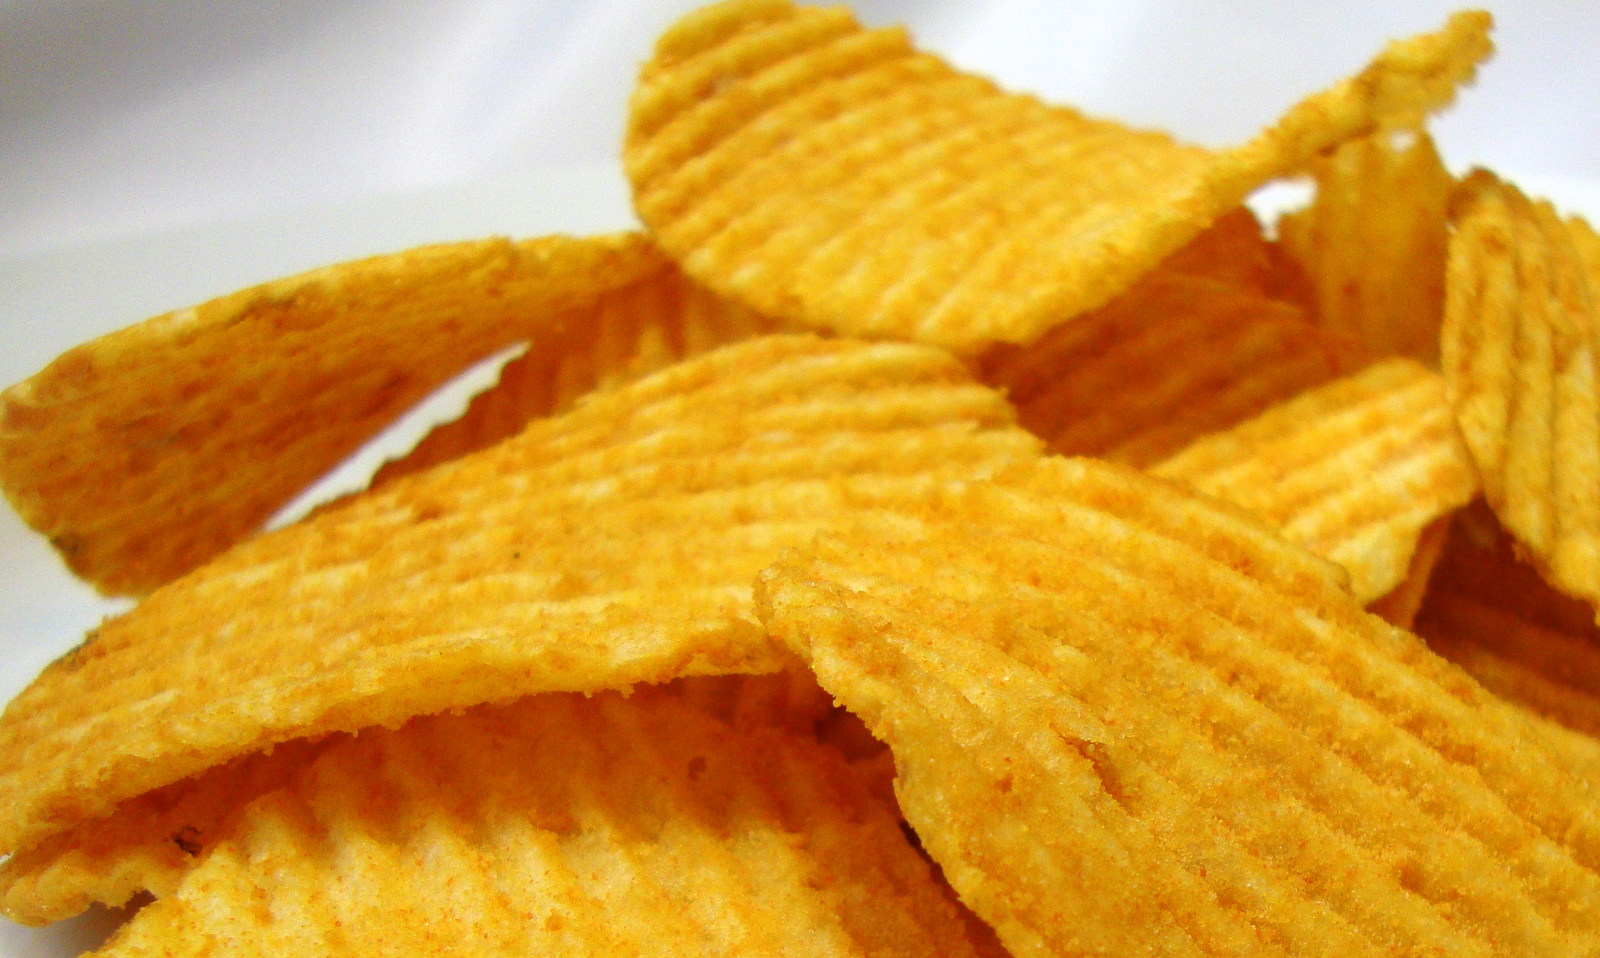 Cheddar and Sour Cream Potato Chip Seasoning